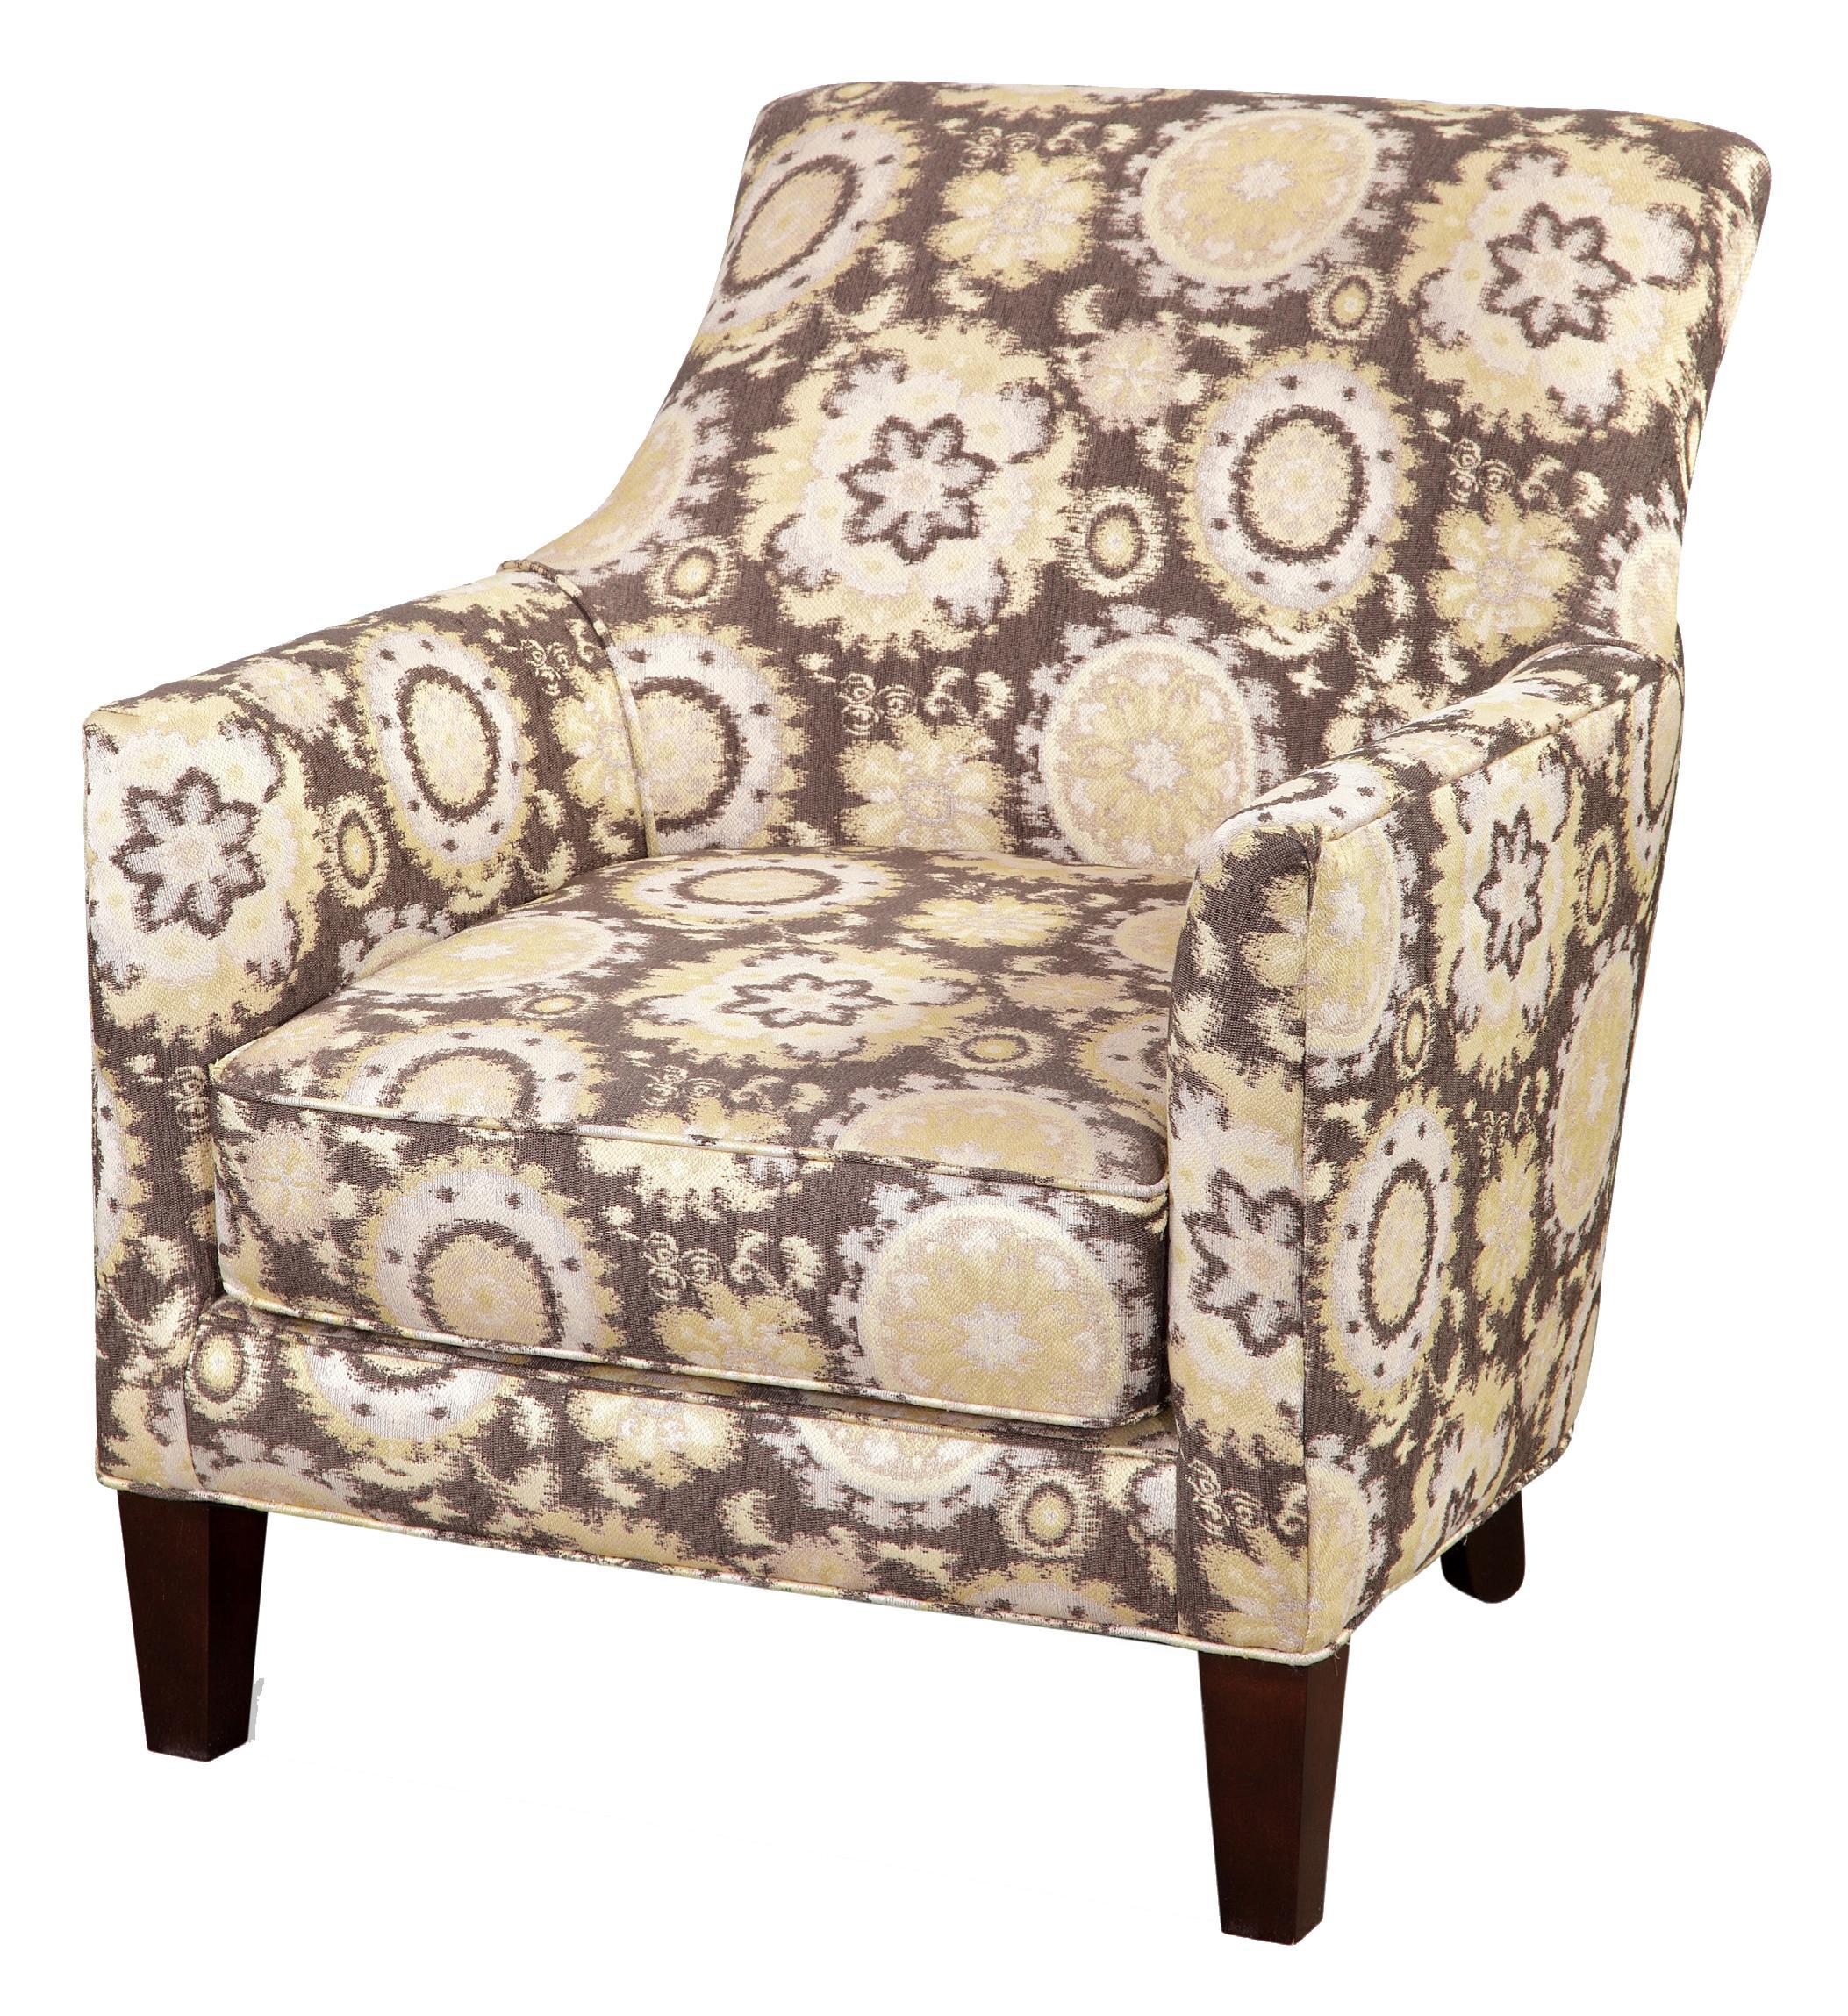 Genial CMI Classic Chair AccentsFlared Back Chair